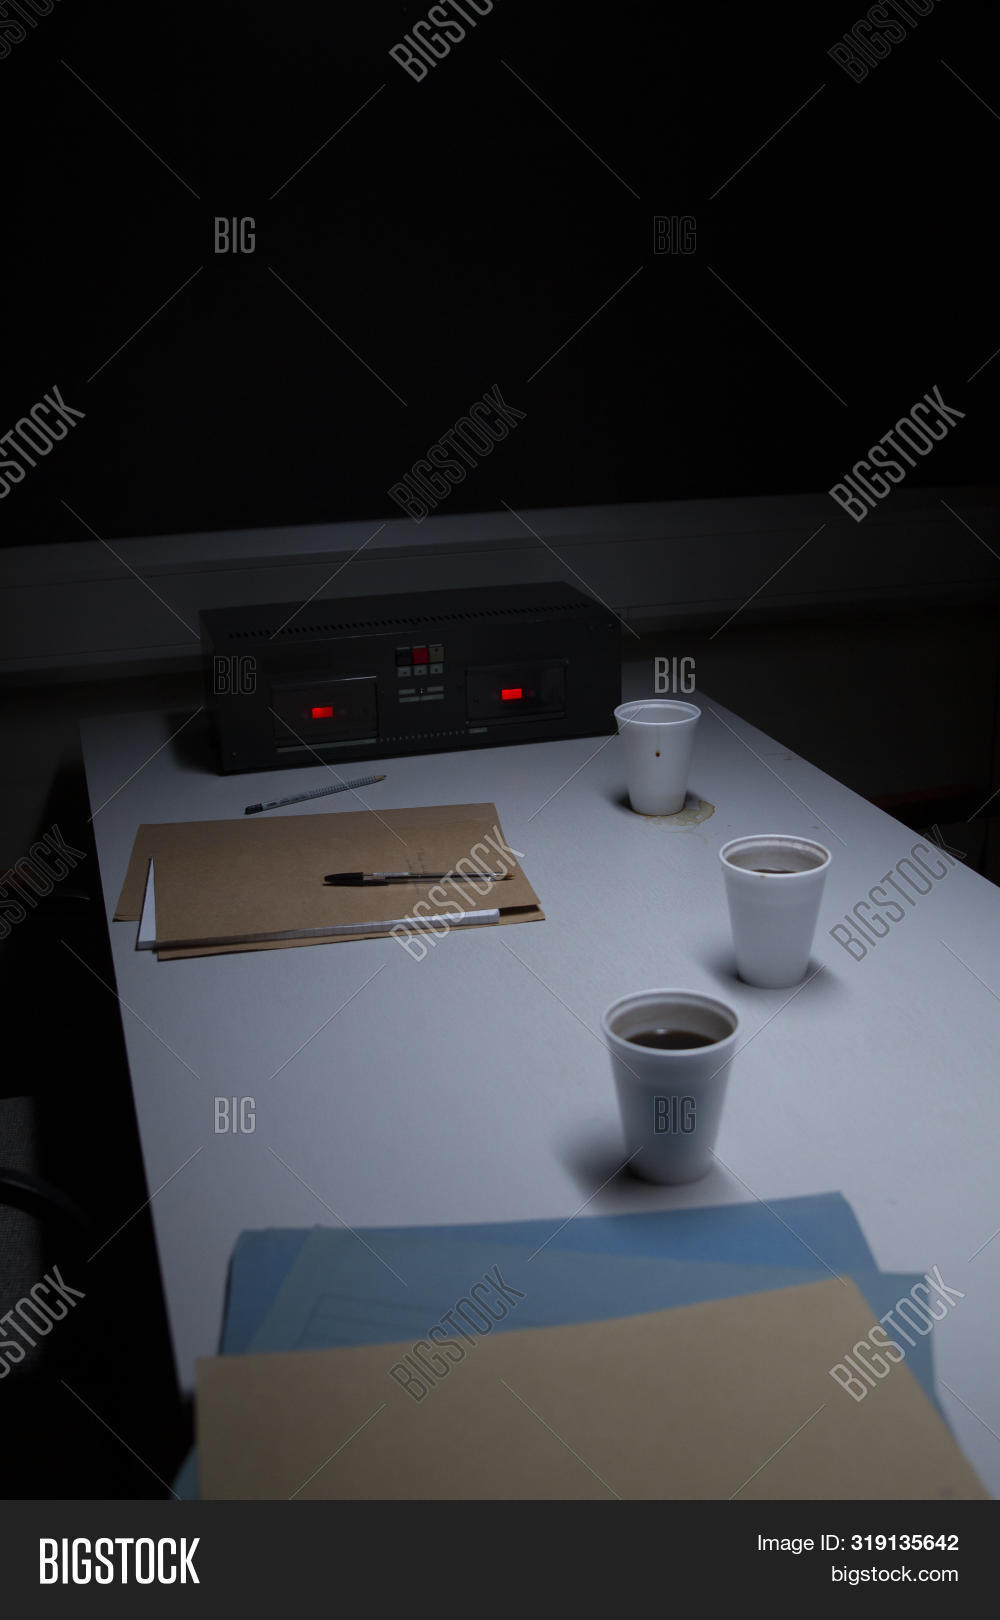 Police Station Custody Interview Room - Subdued Lighting, Intimidating